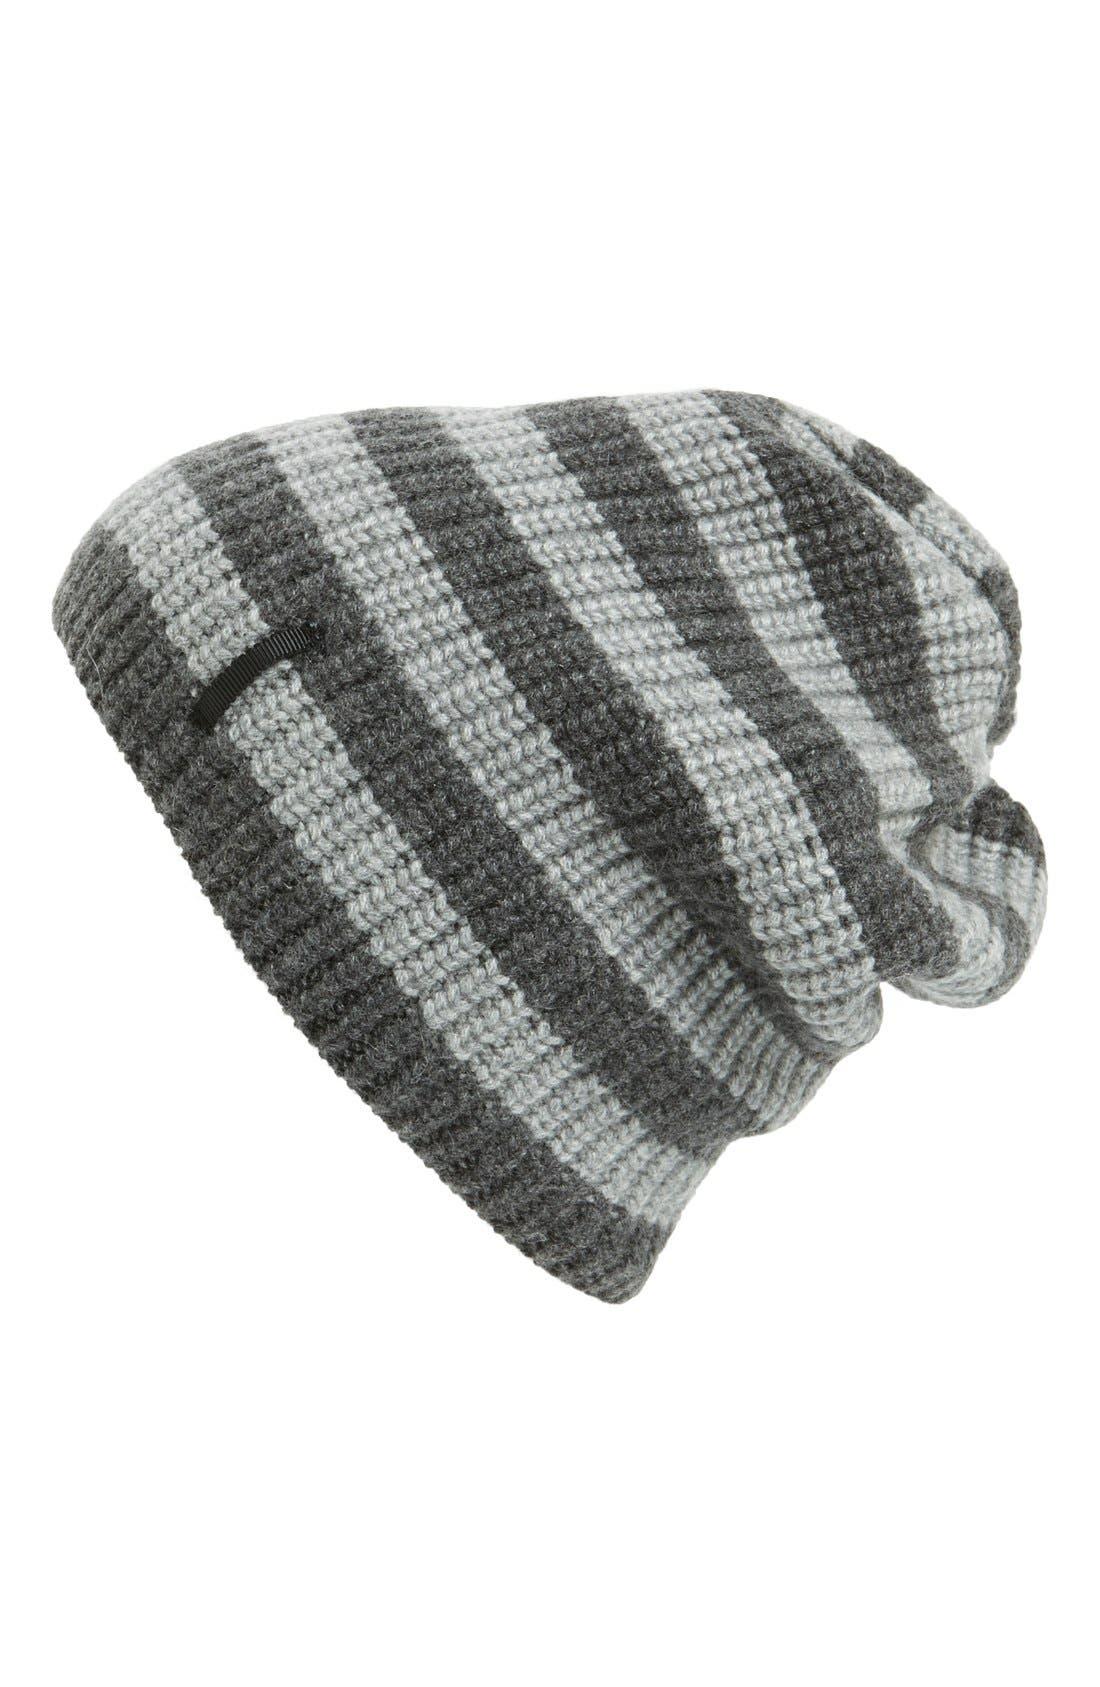 Alternate Image 1 Selected - rag & bone 'Carson Stripe' Cashmere Beanie